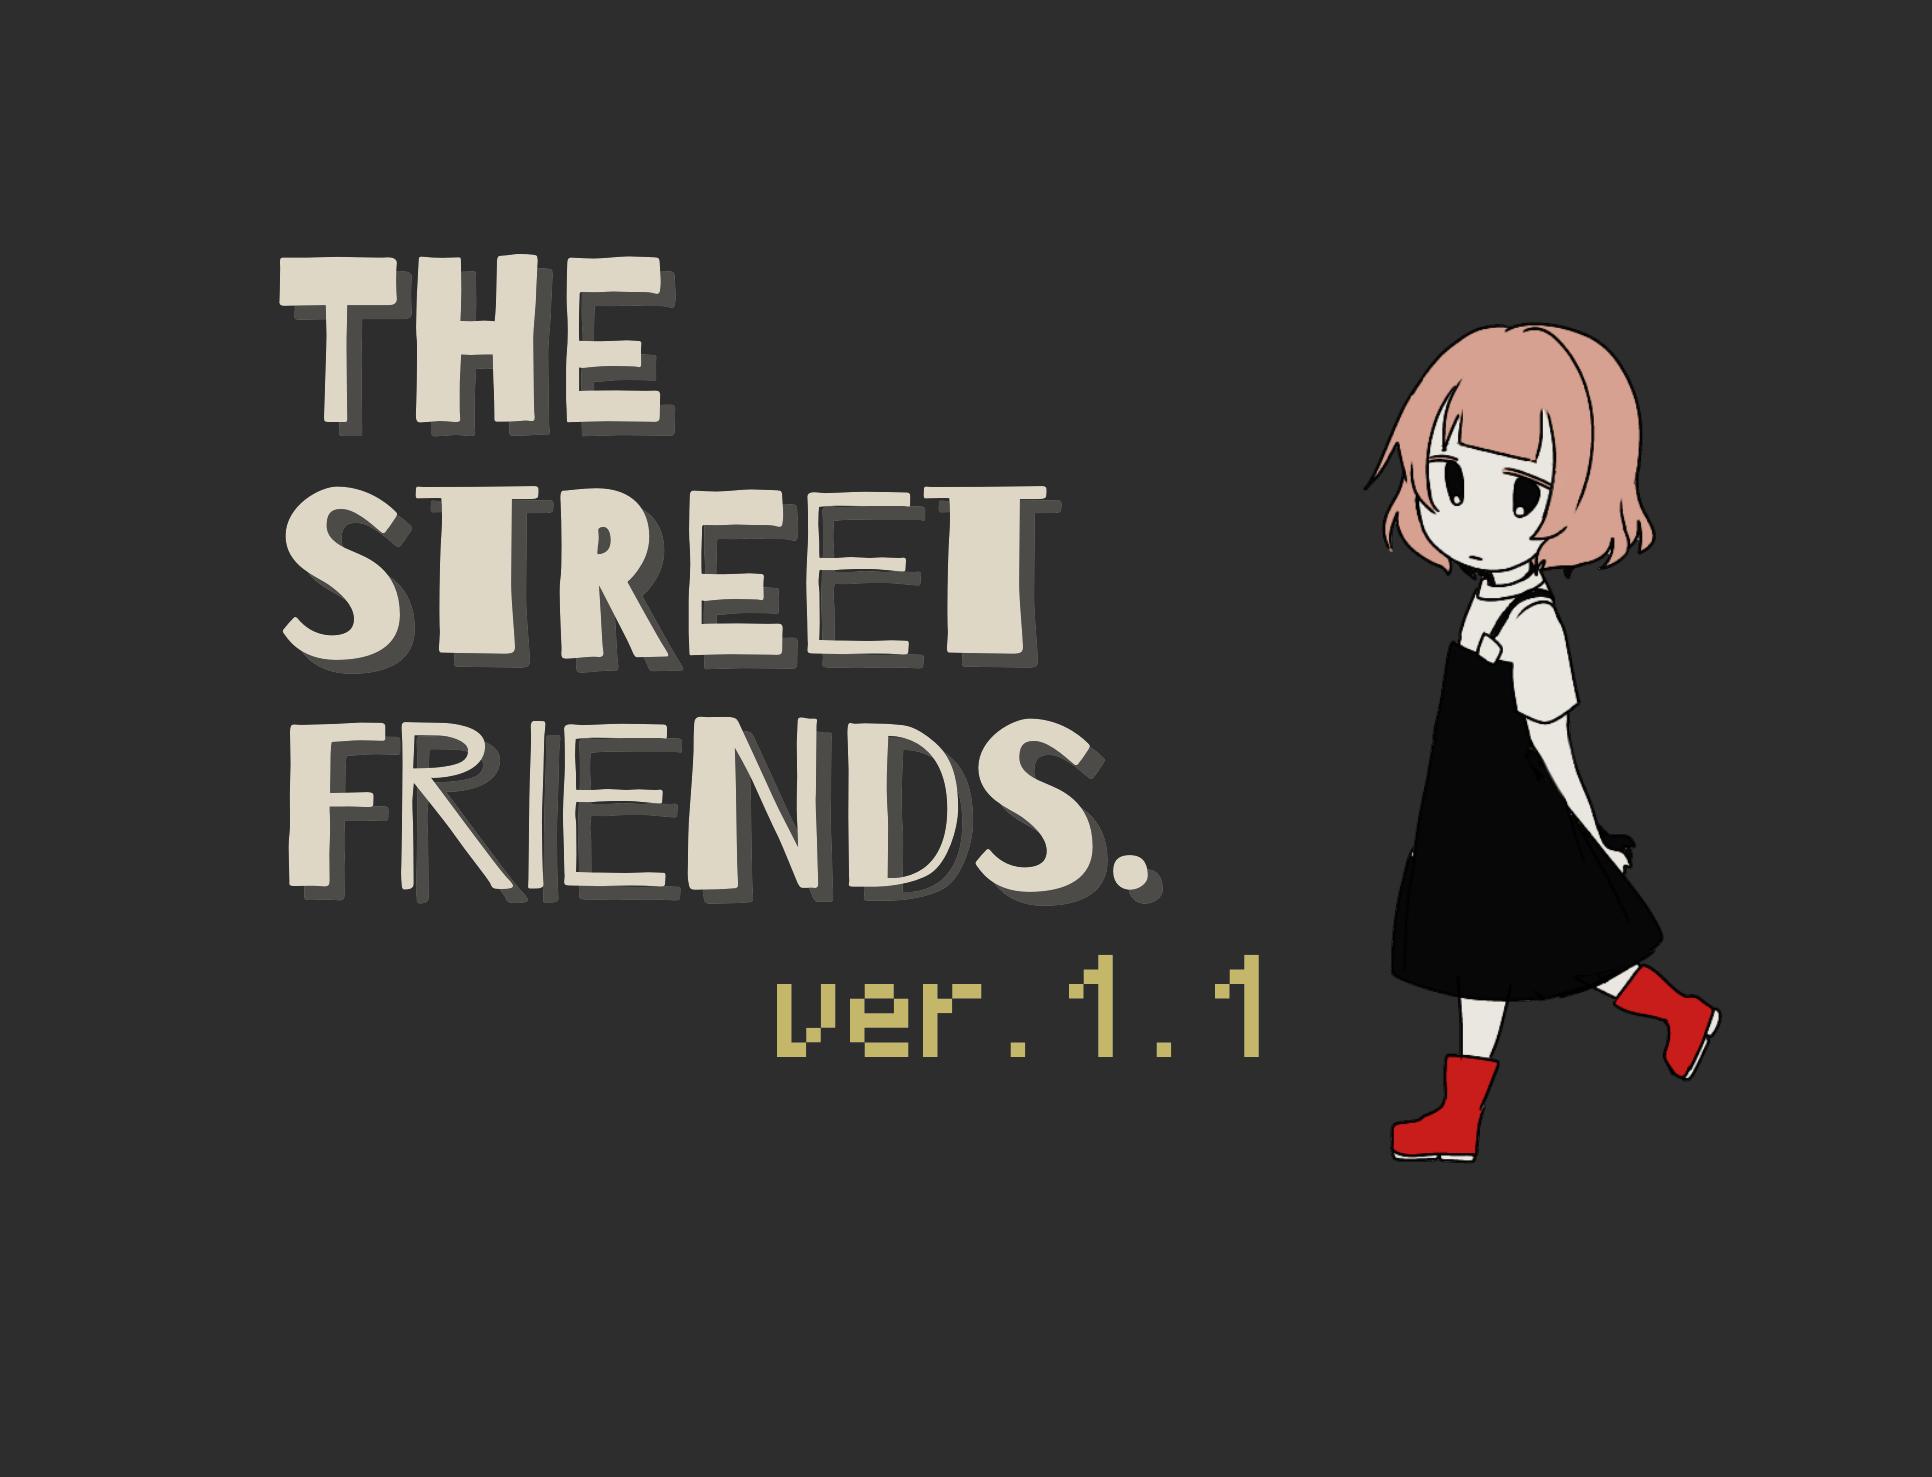 THE STREET FRIENDS.